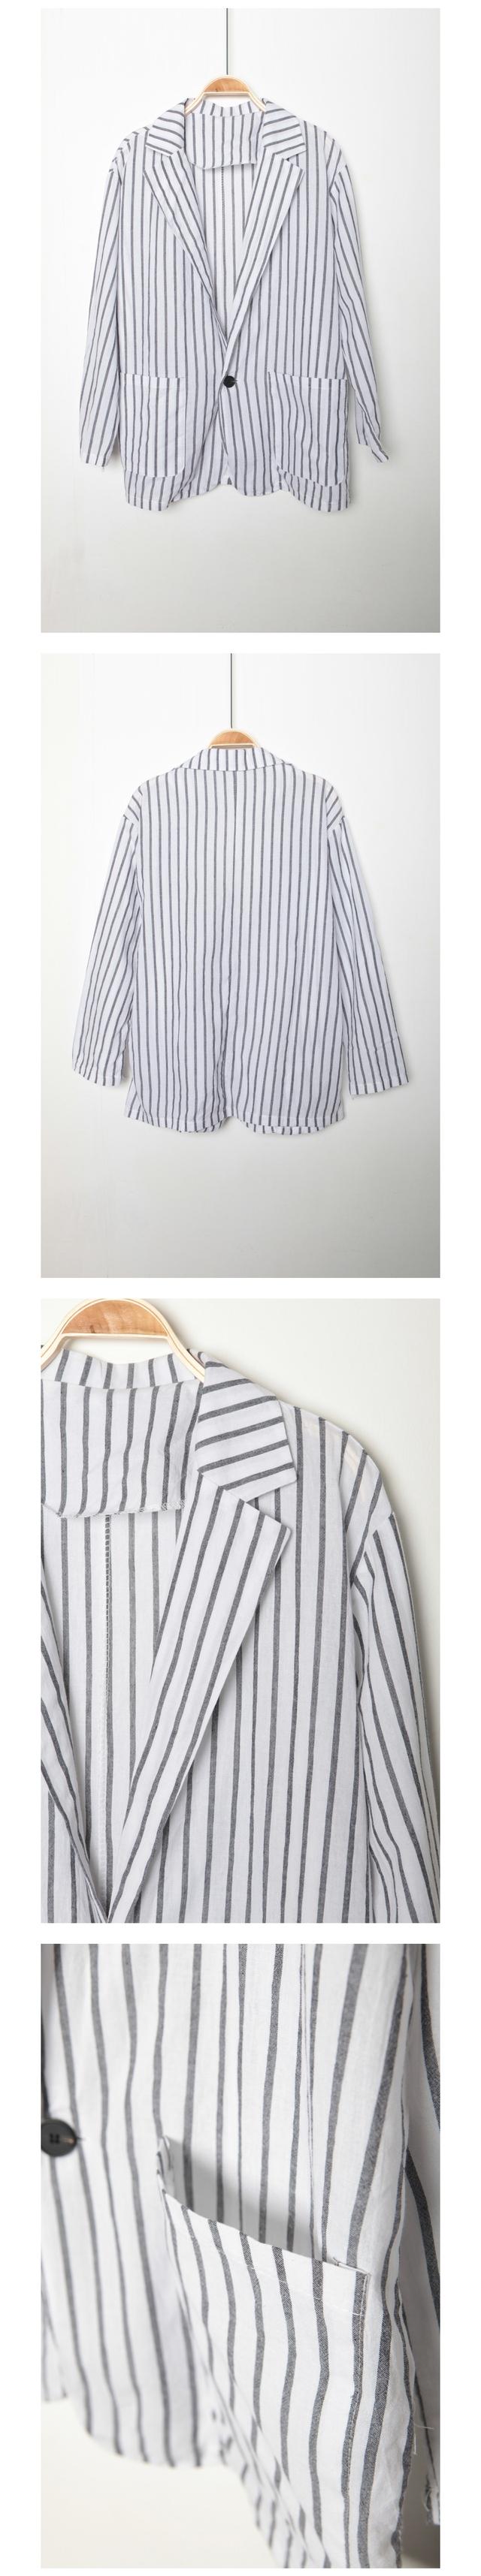 Travel Striped Jacket